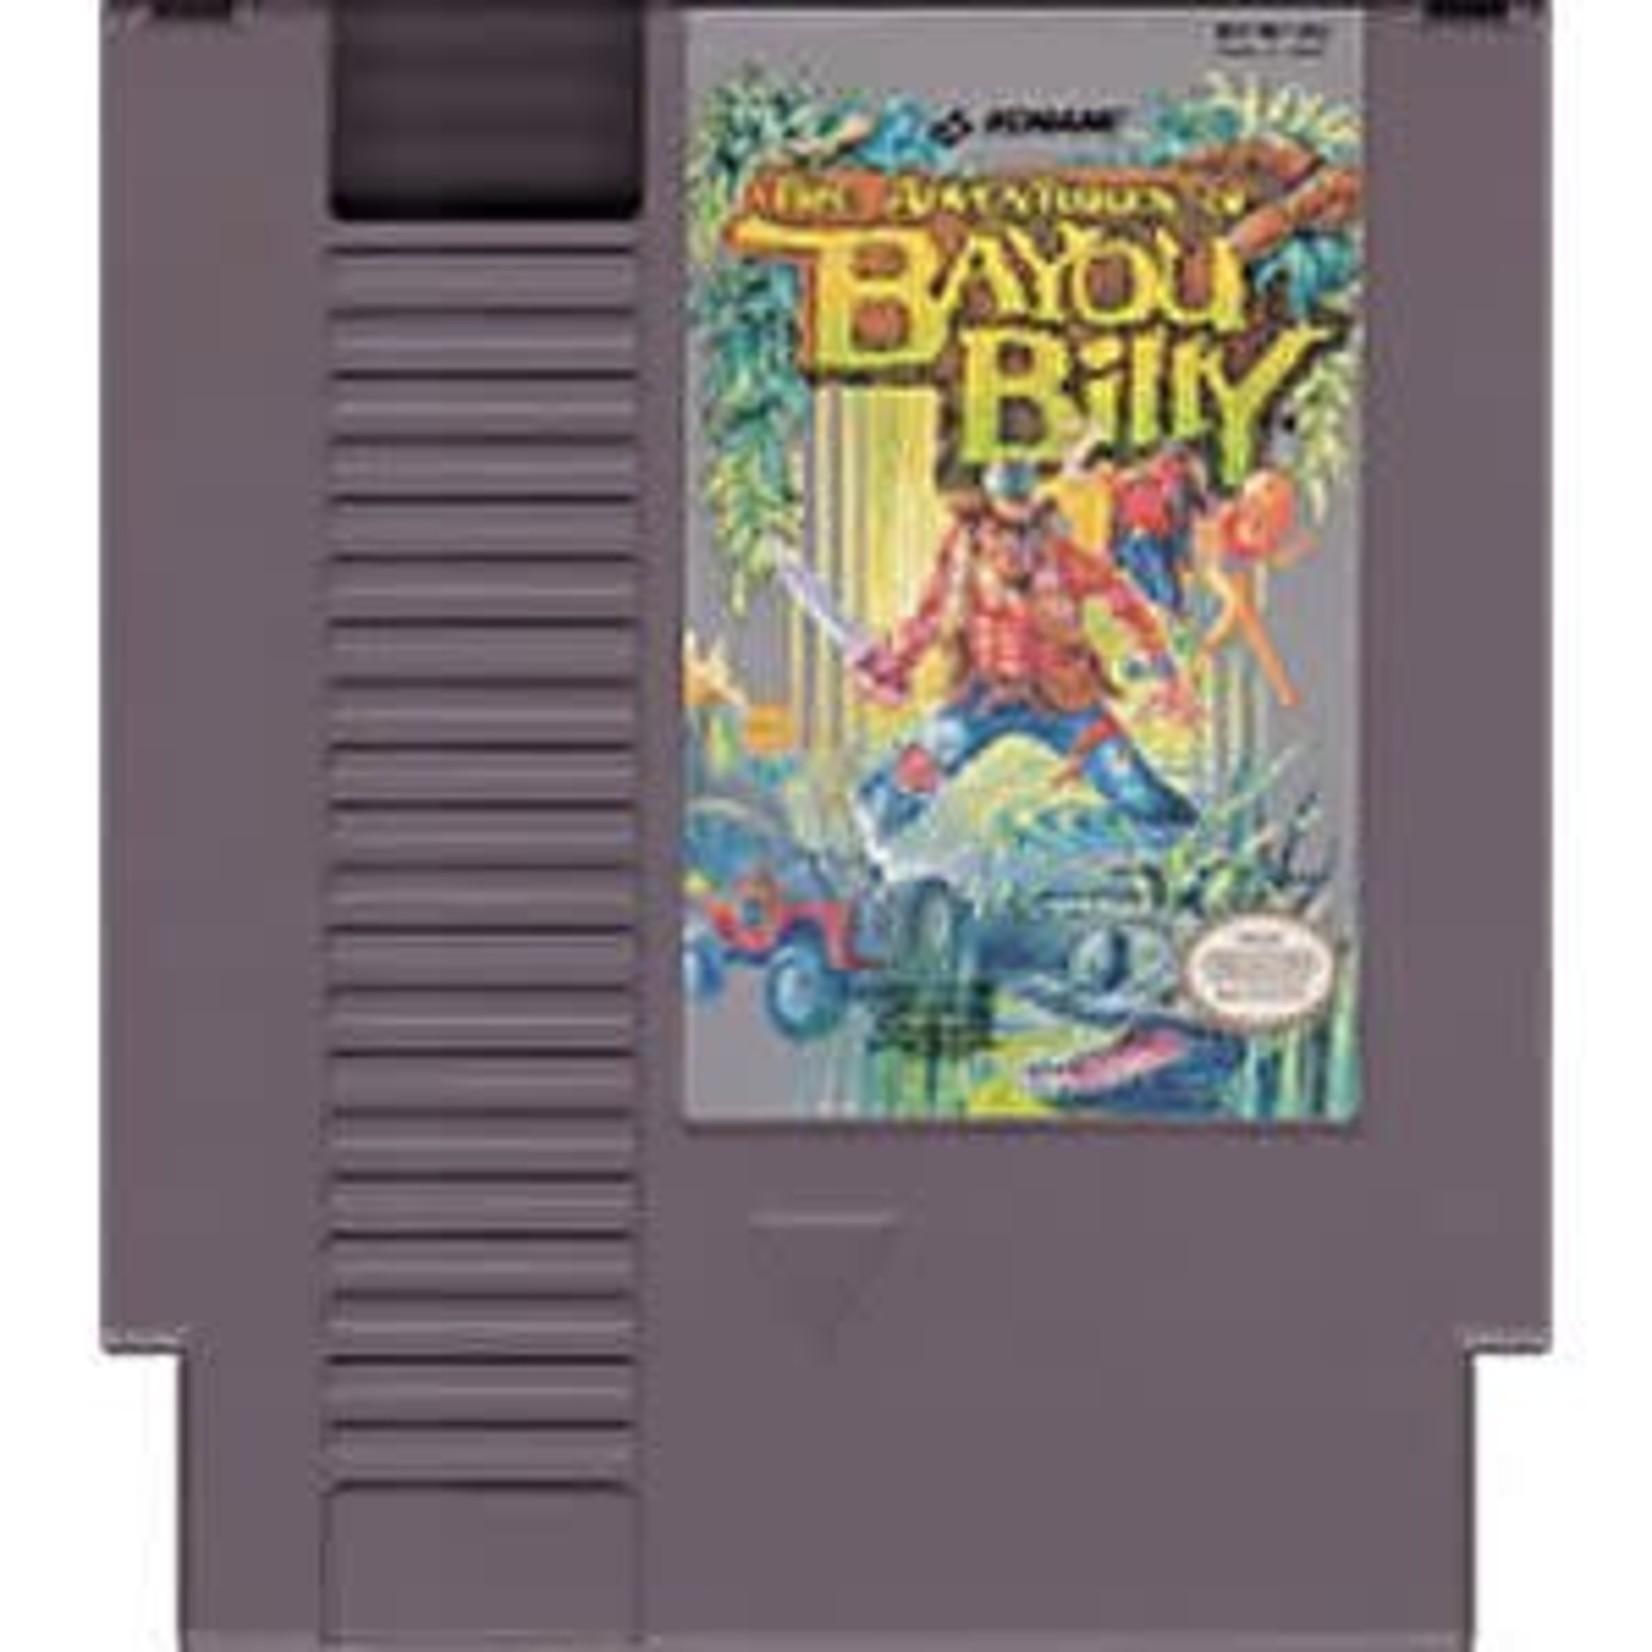 Adventures of Bayou Billy (NES)